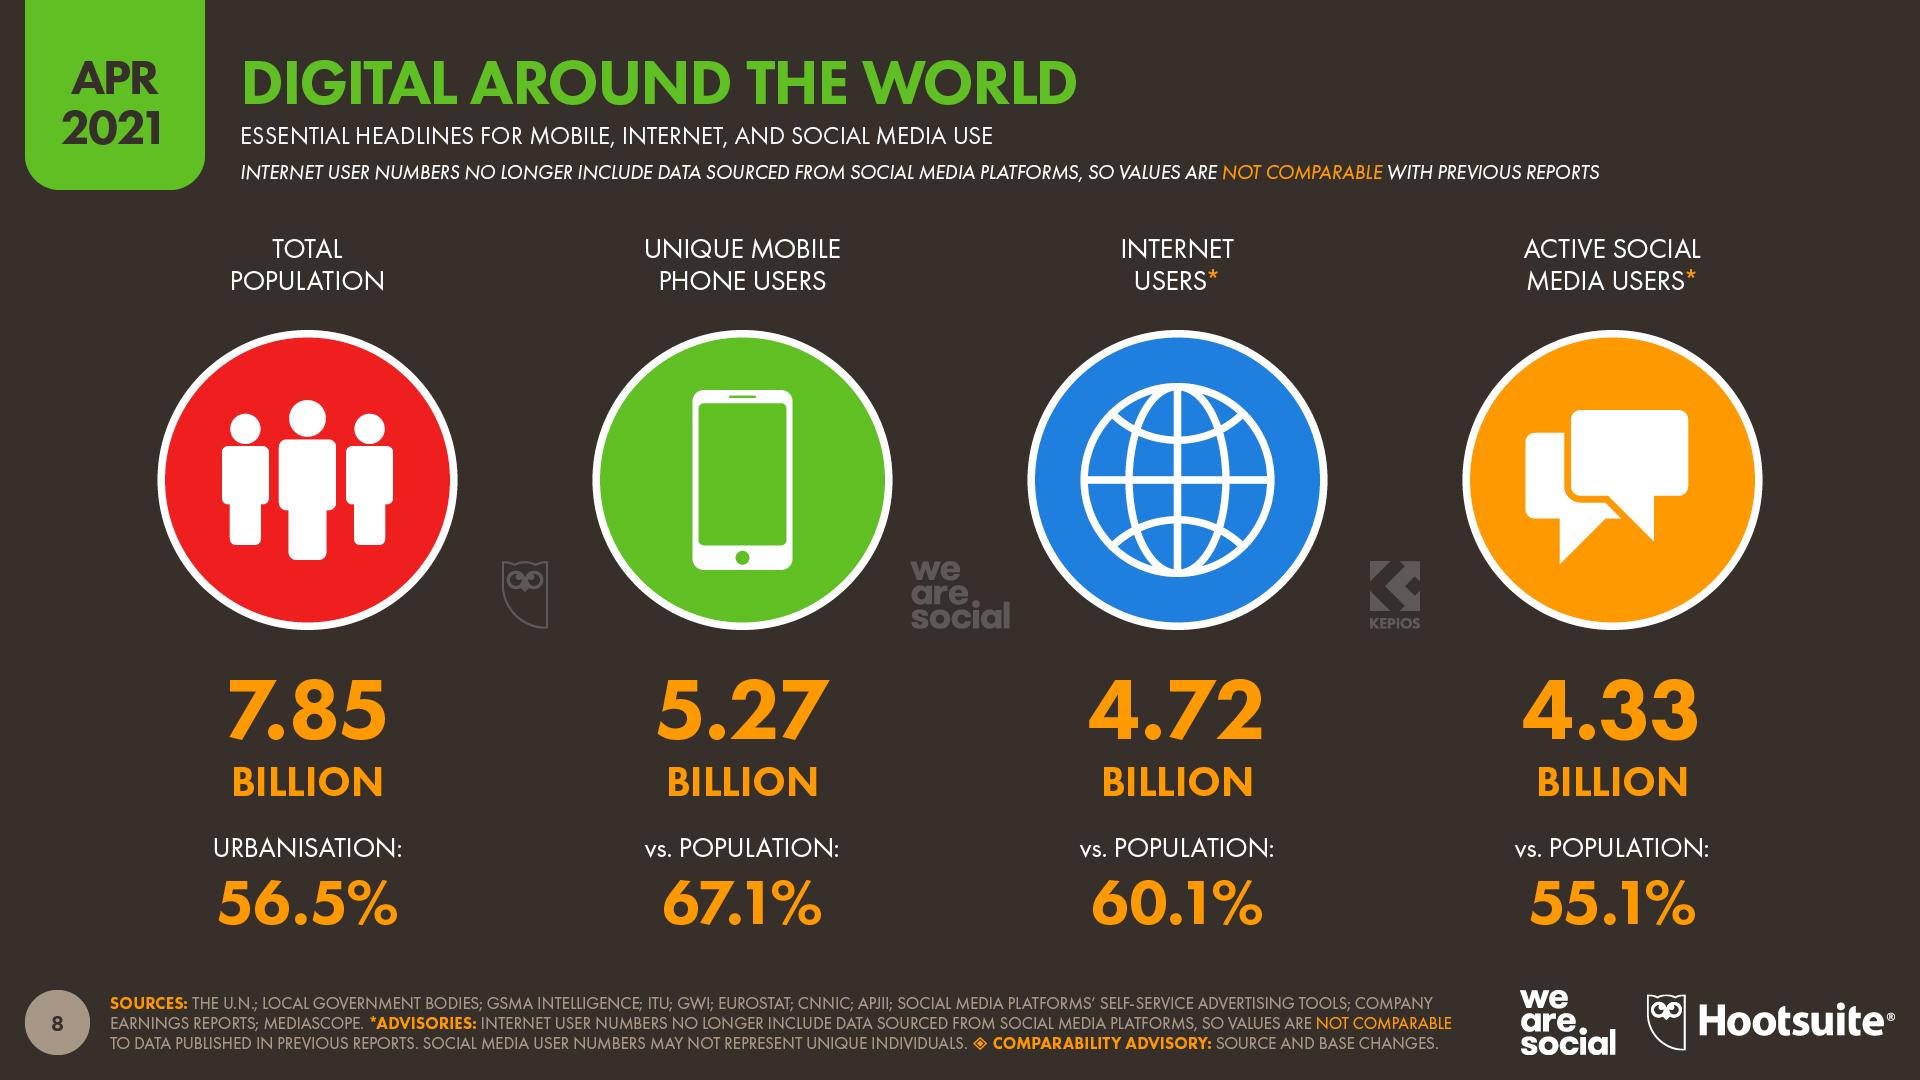 Global Digital Overview April 2021 DataReportal